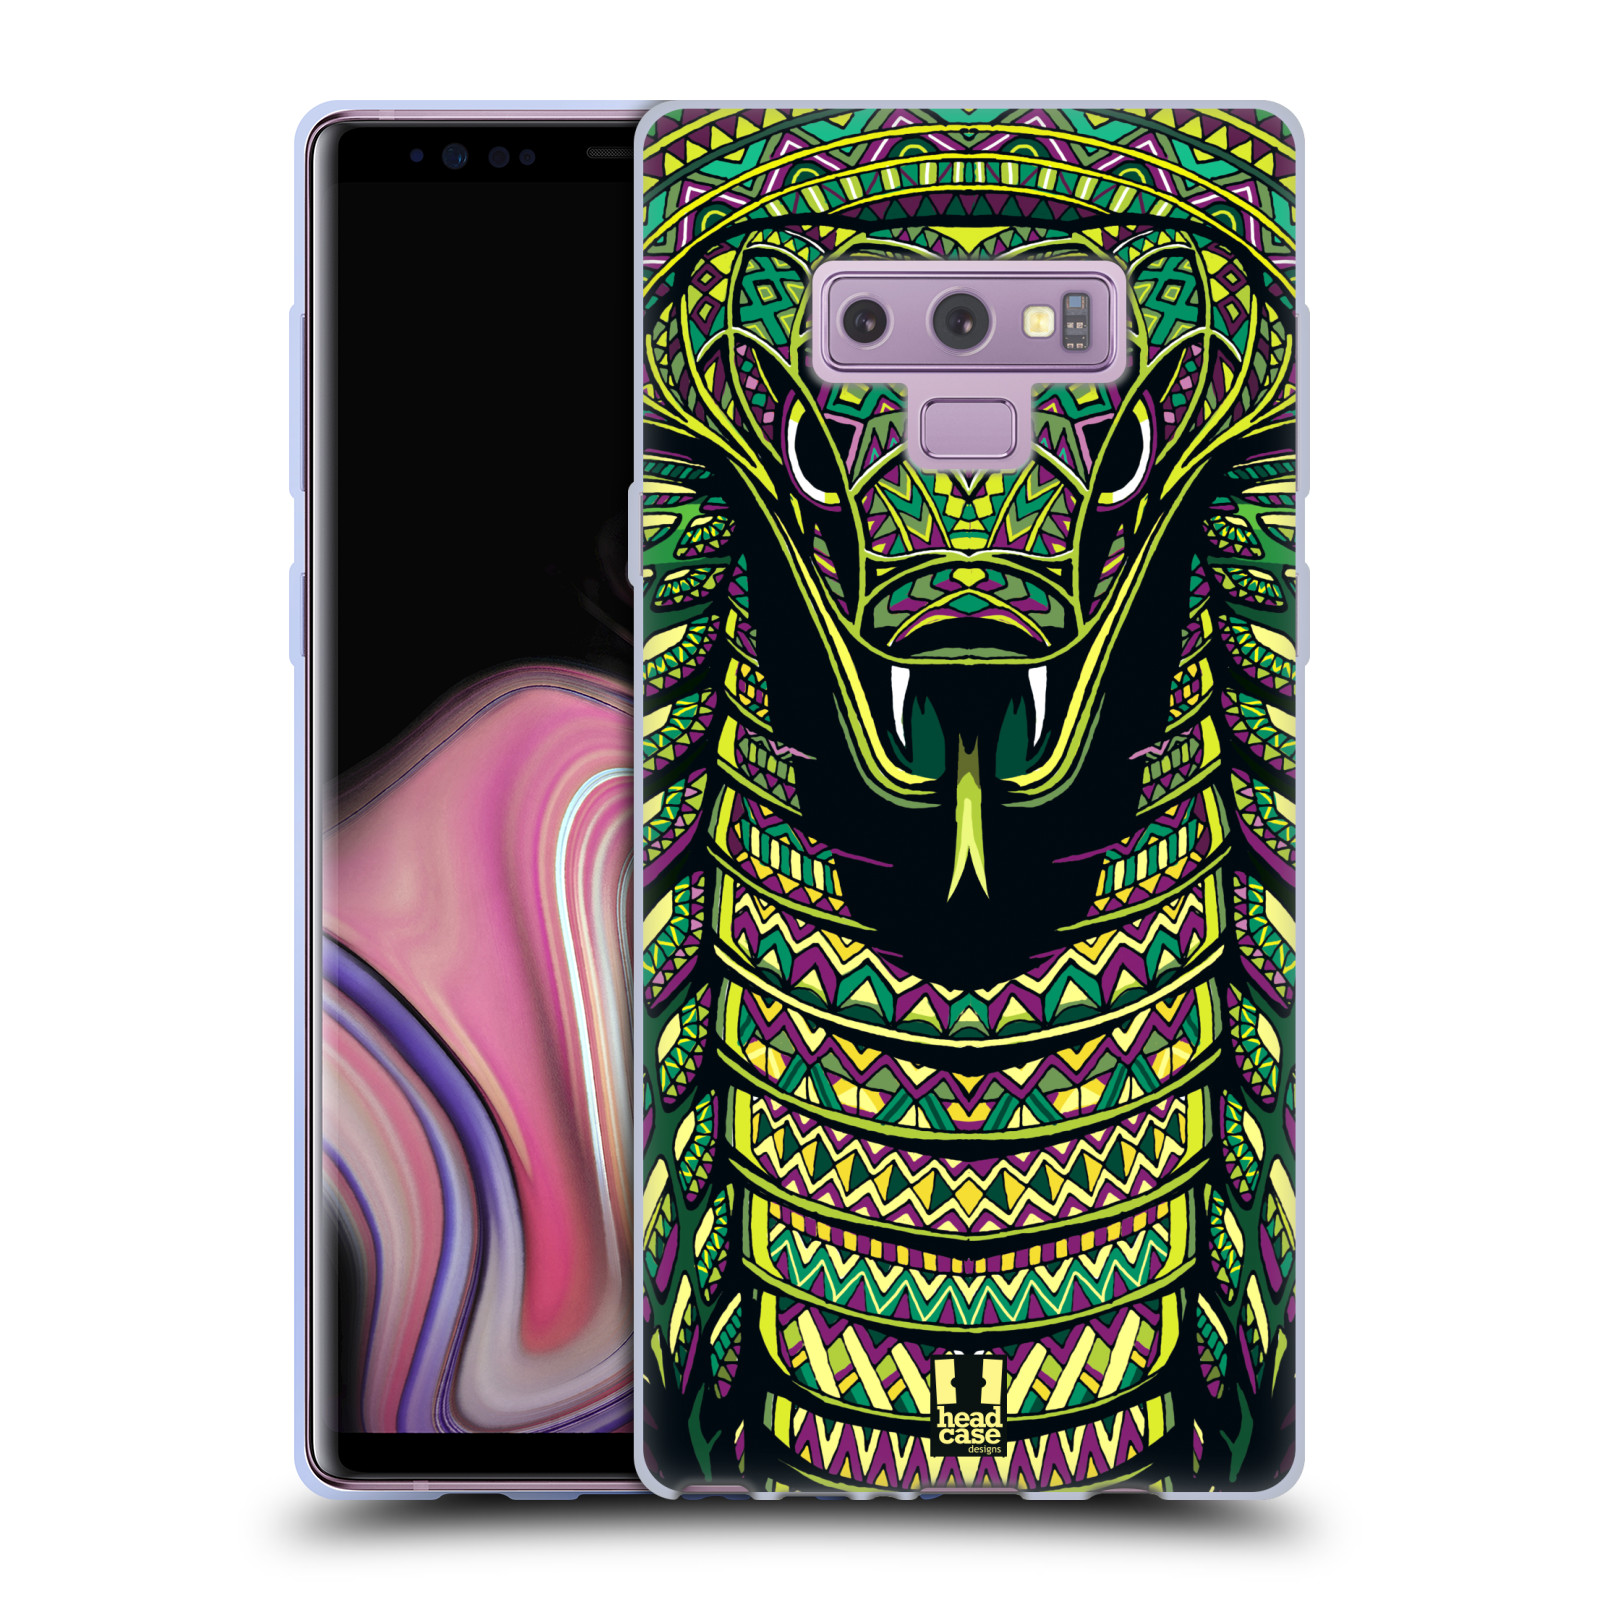 Silikonové pouzdro na mobil Samsung Galaxy Note 9 - Head Case - AZTEC HAD